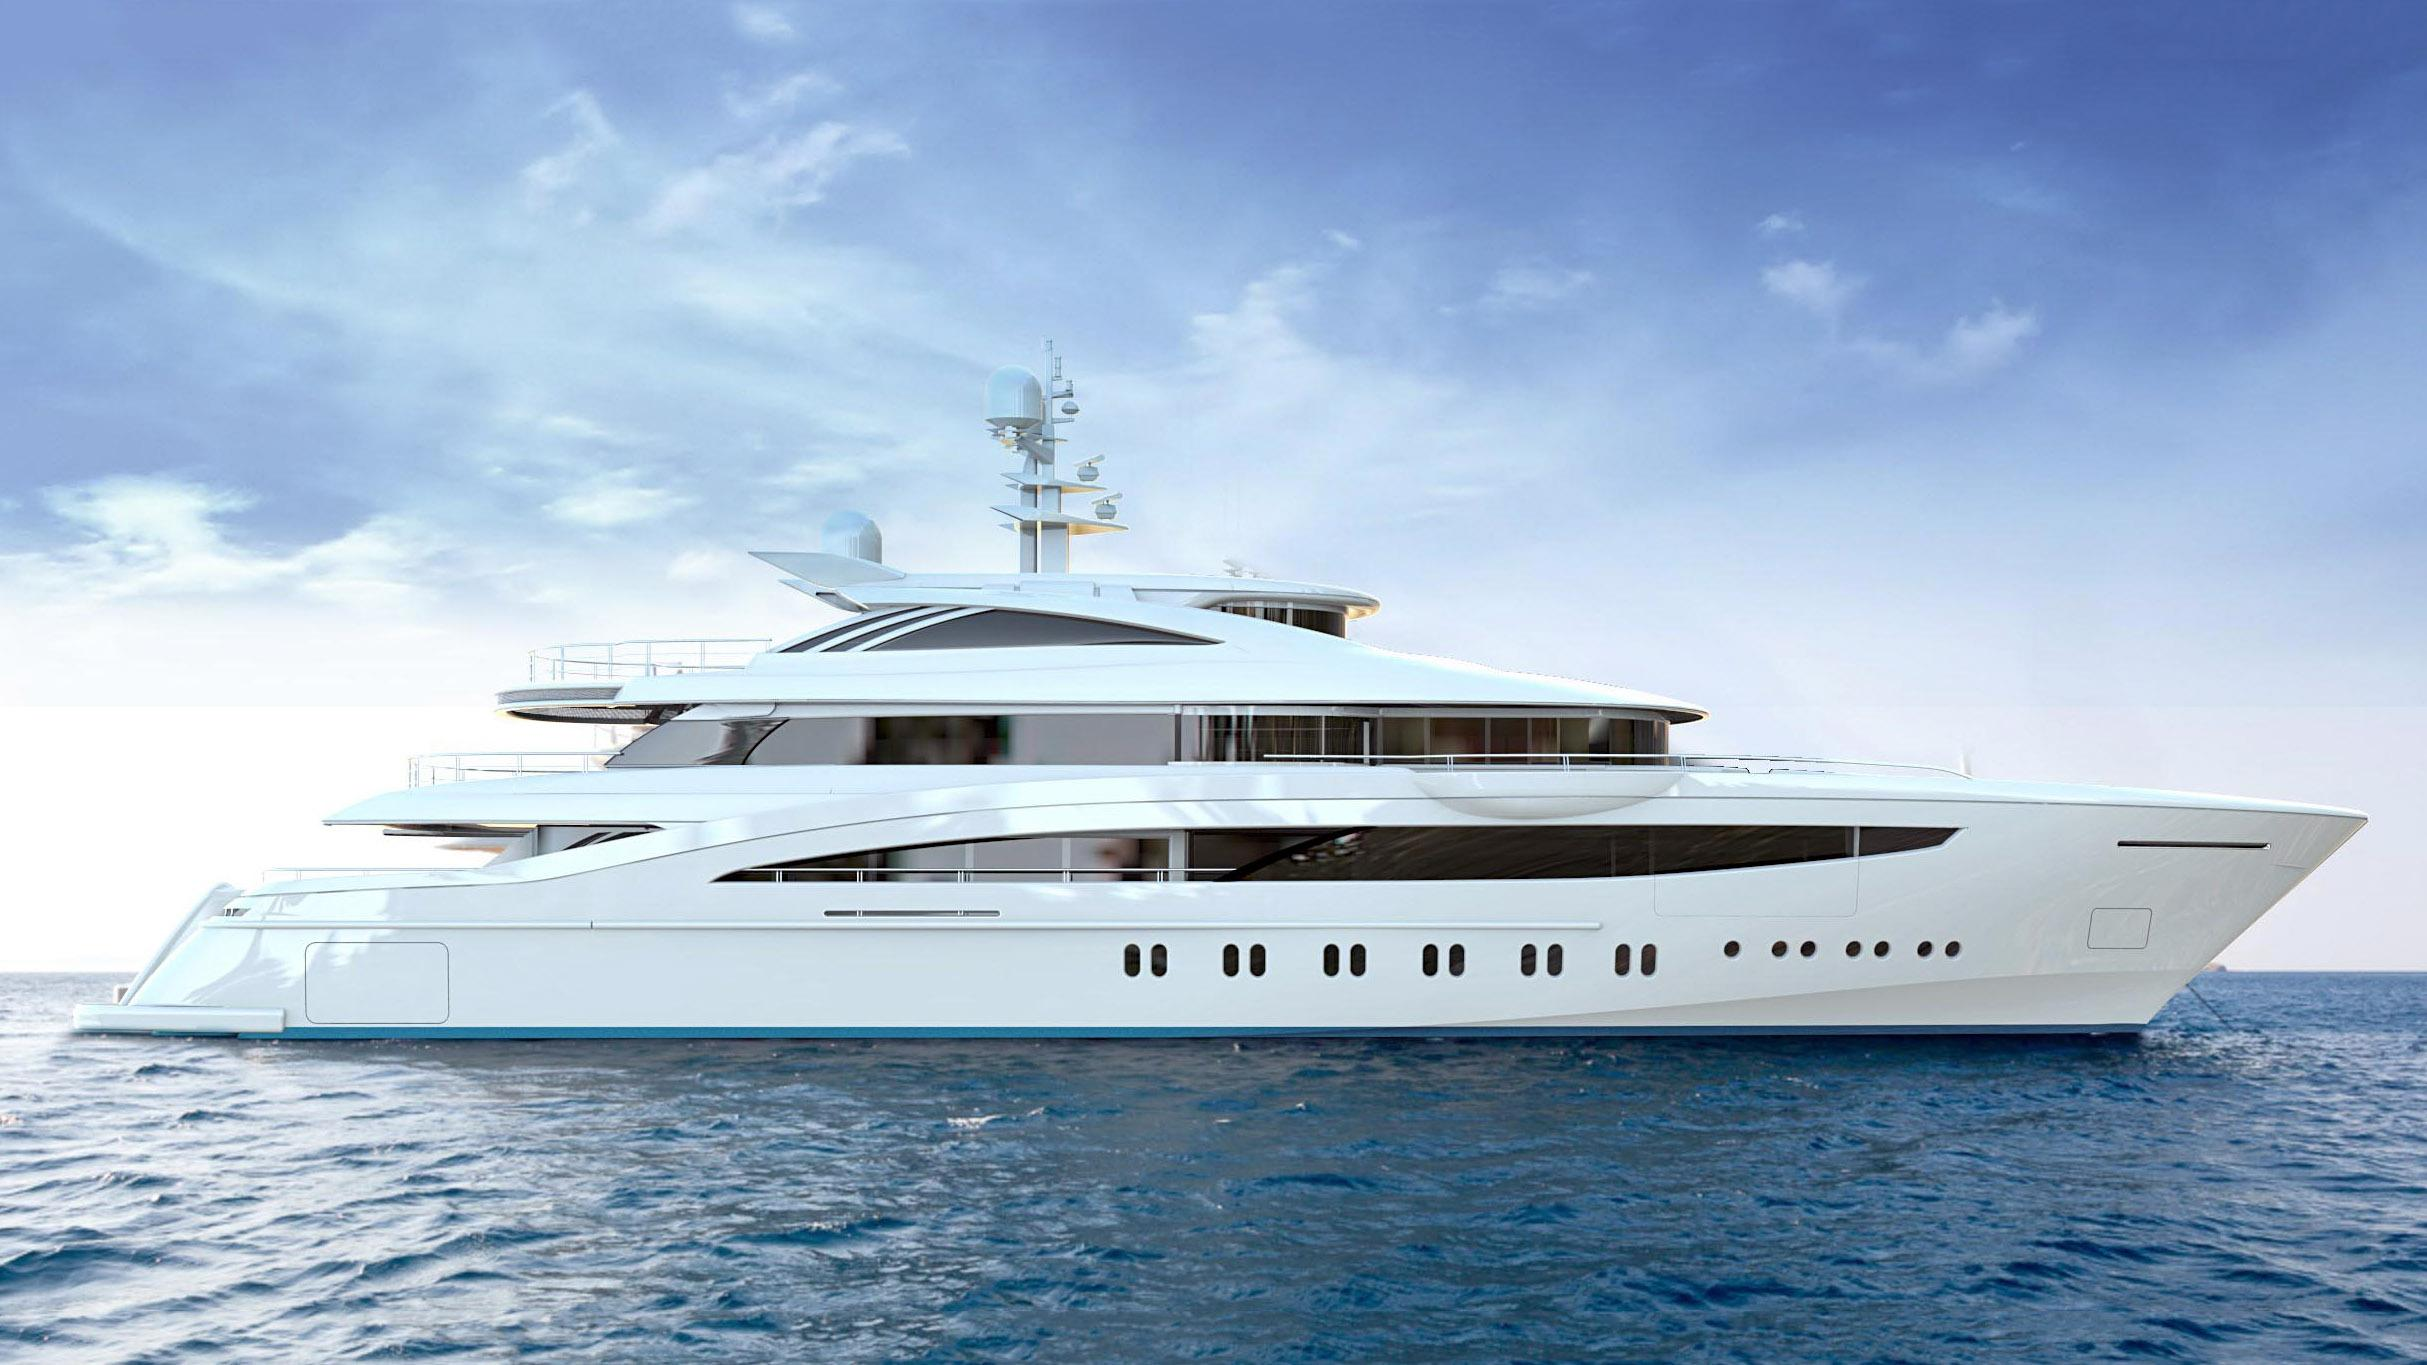 florentia fr039 motoryacht rossinavi 52m 2020 rendering